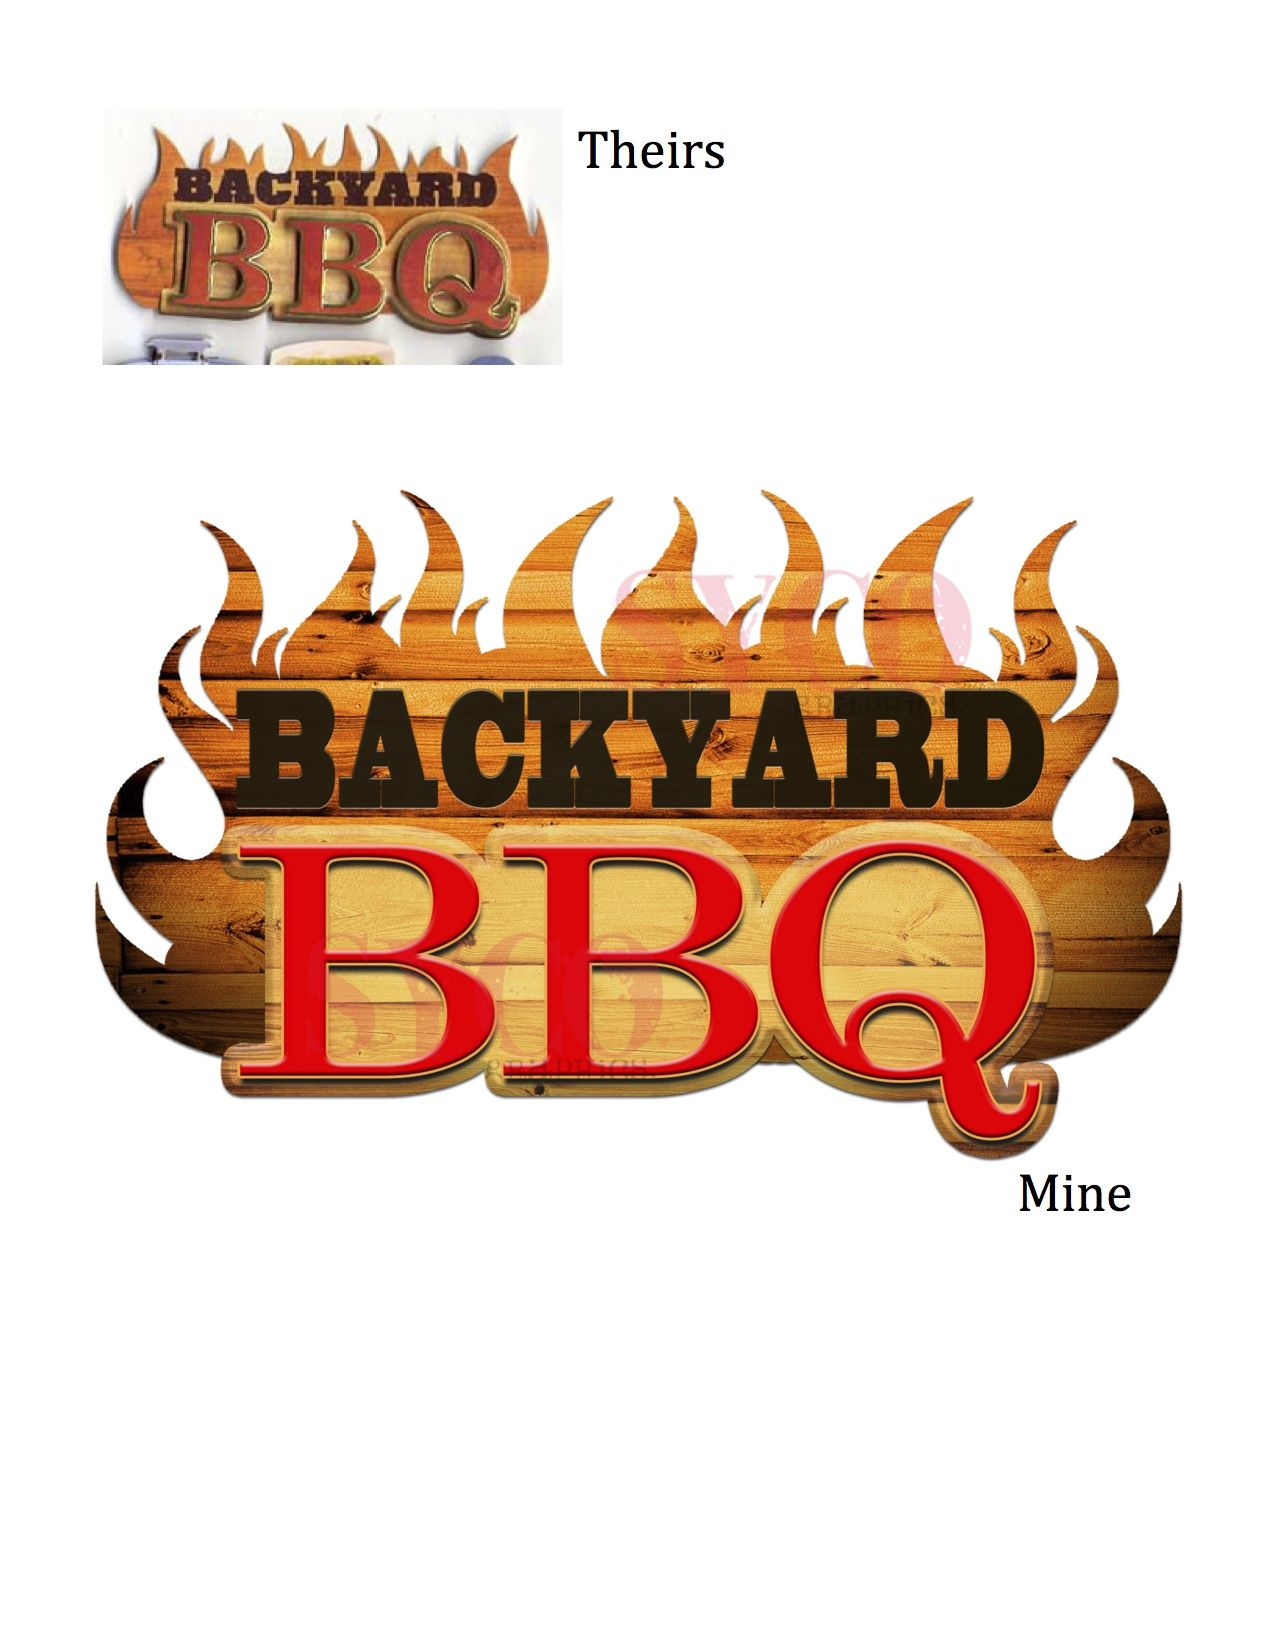 Backyard BBQ logo Designed For: Cory Thomas